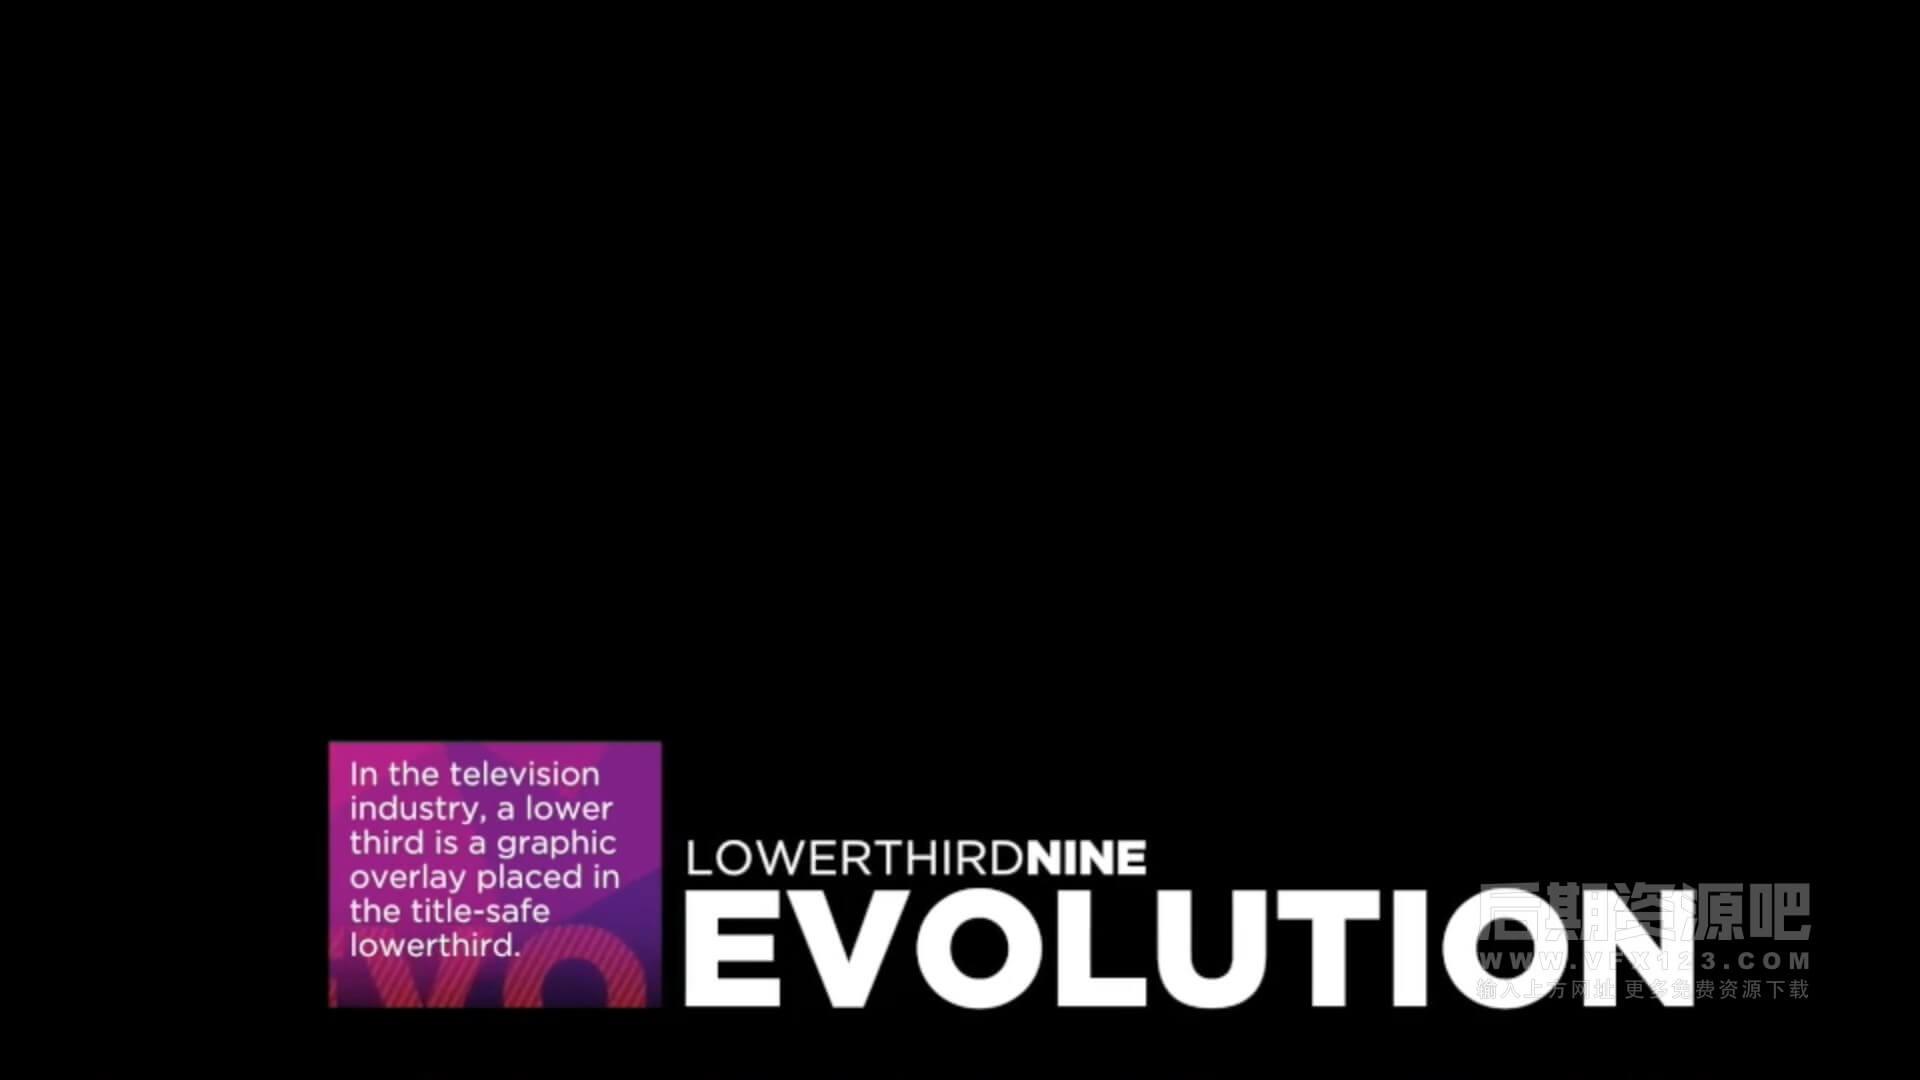 fcpx插件 10组时尚动感标题预设下三分之一字幕条模板 Evolution Lower-Thirds